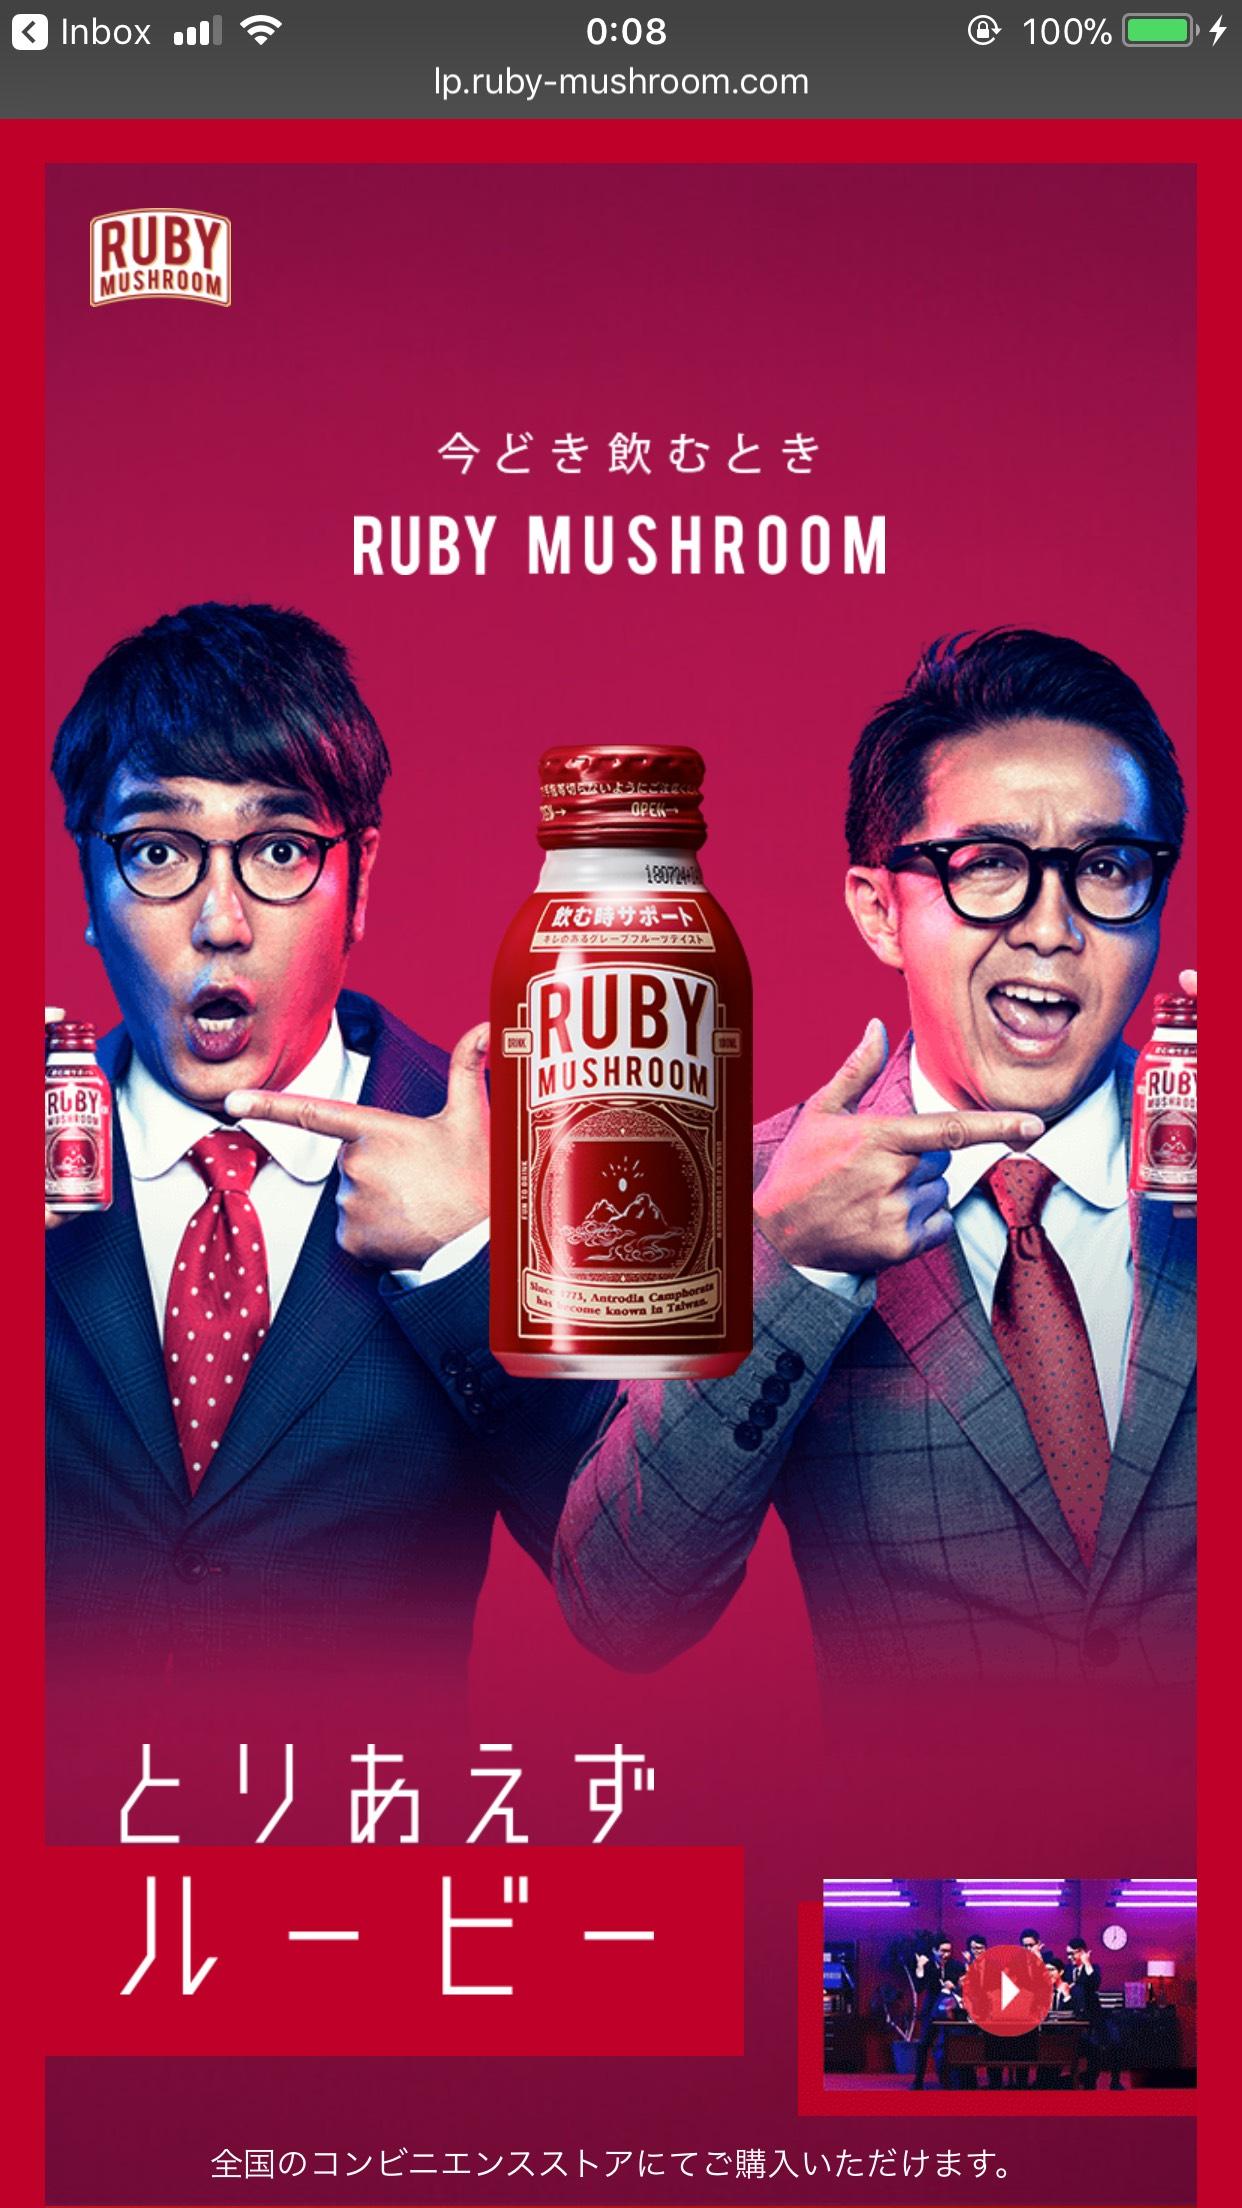 RUBY MUSHROOM | 今どき飲むとき ルビーマッシュルーム